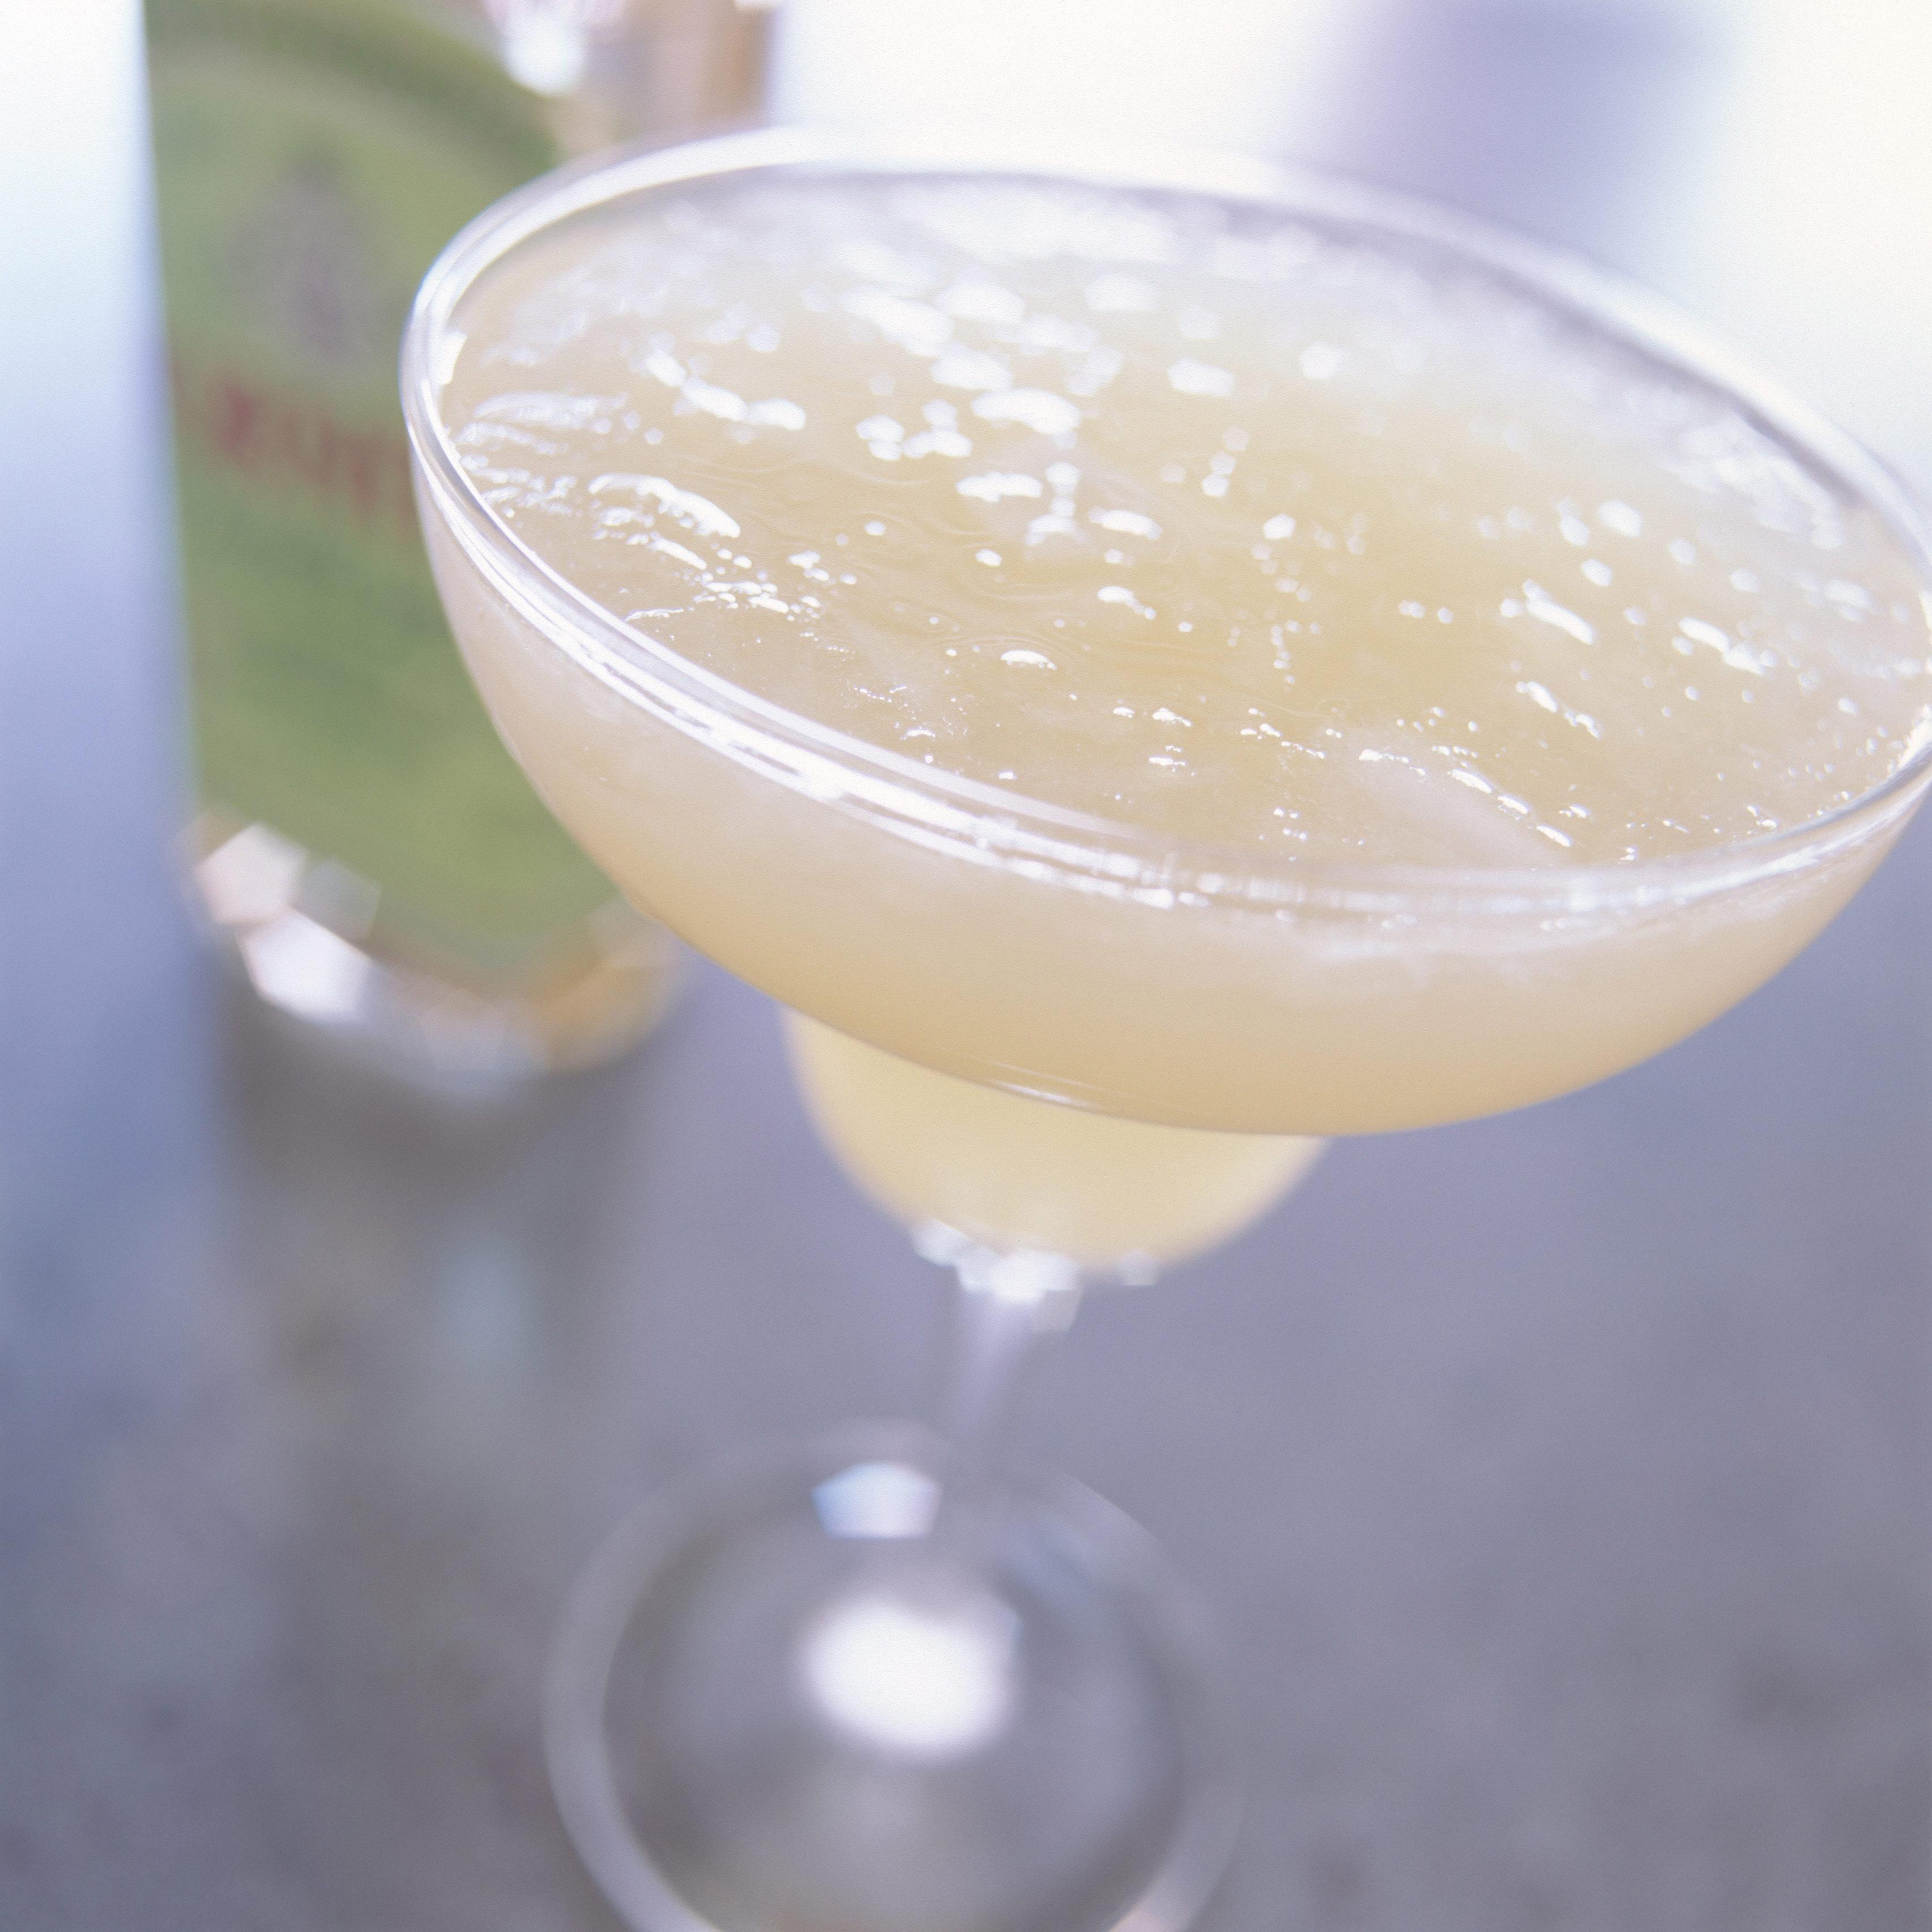 The Best Fresh Margaritas Recipe - Cook's Illustrated